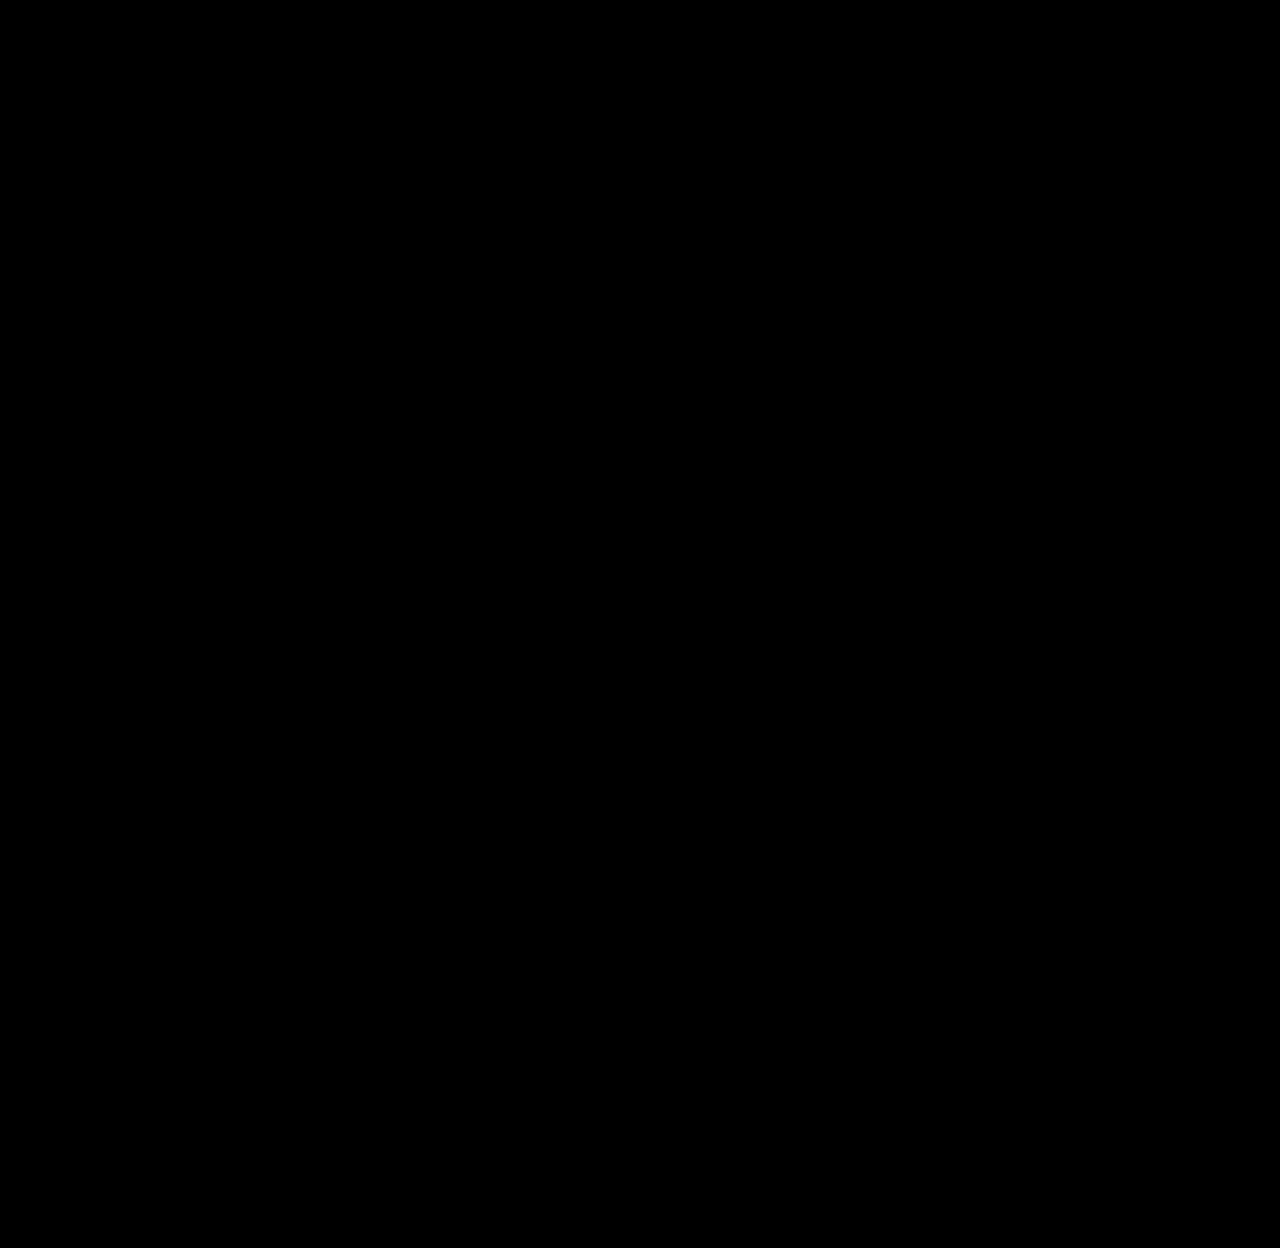 logo_paramètre.png